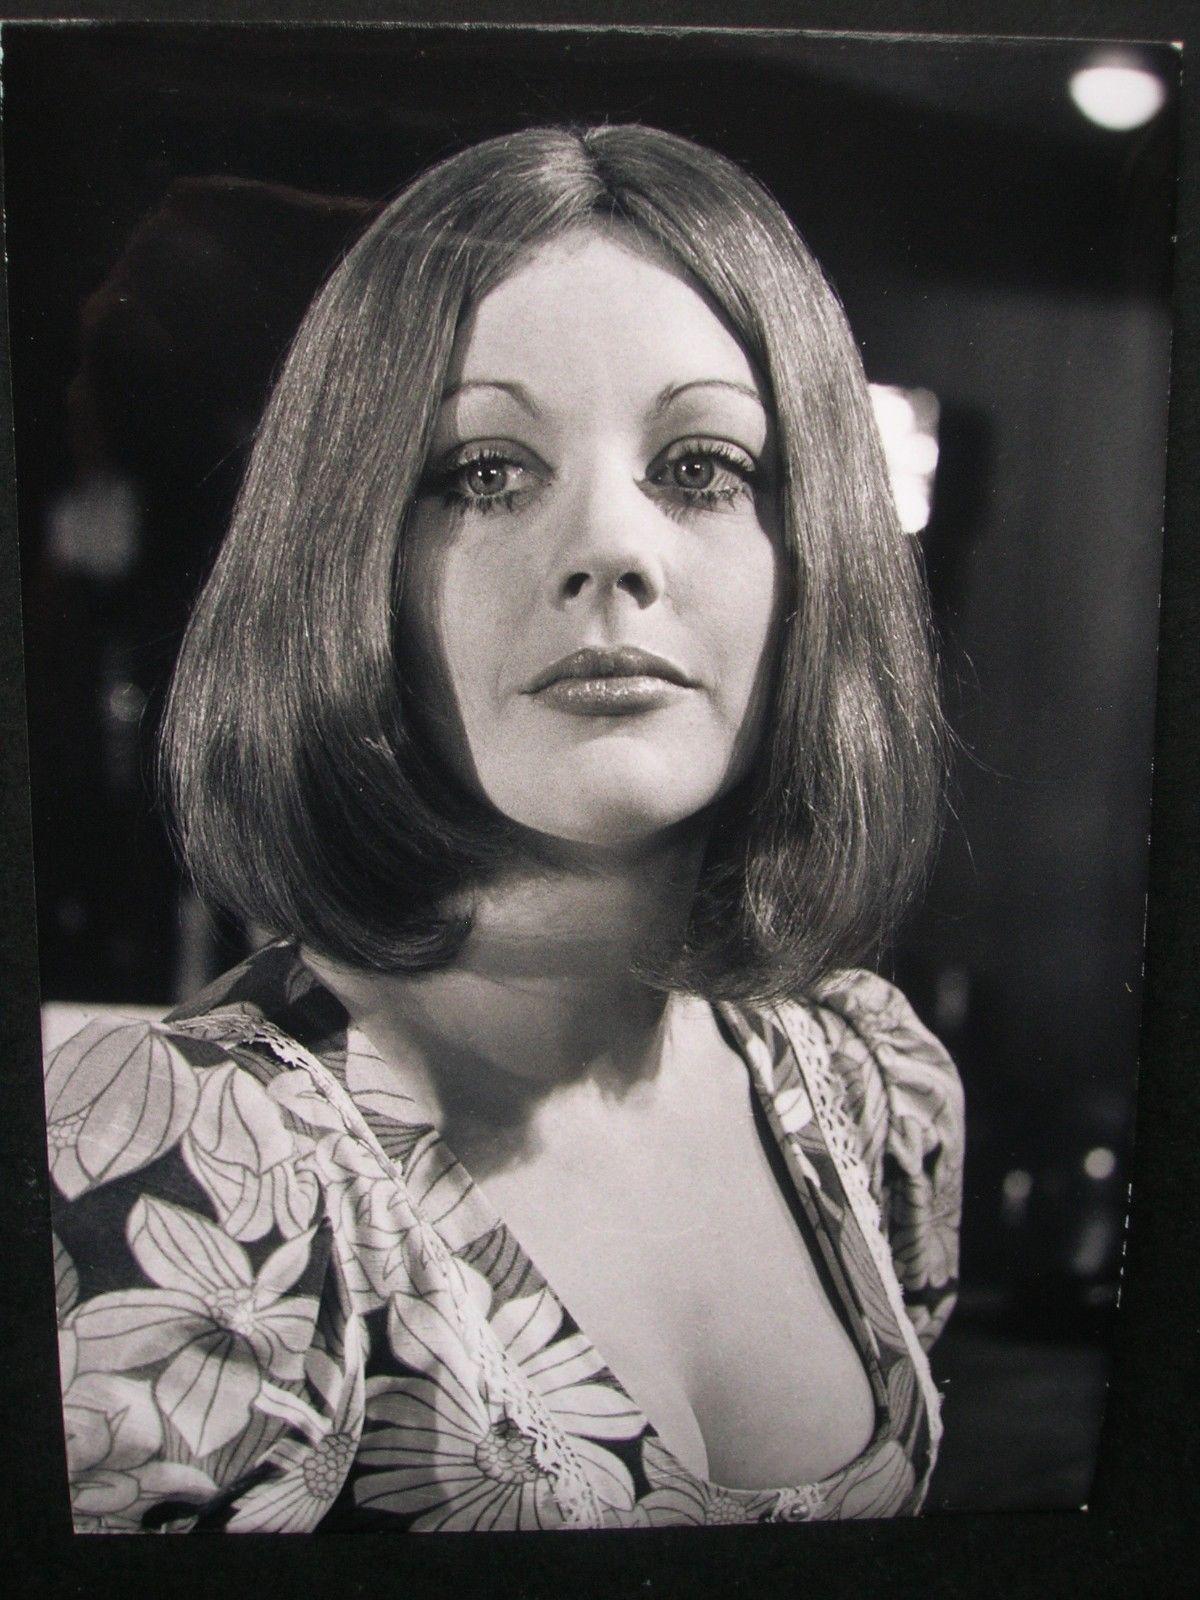 Renee Clama Porno photo Gloria Sevilla (b. 1932),Daniel Sharman (born 1986)